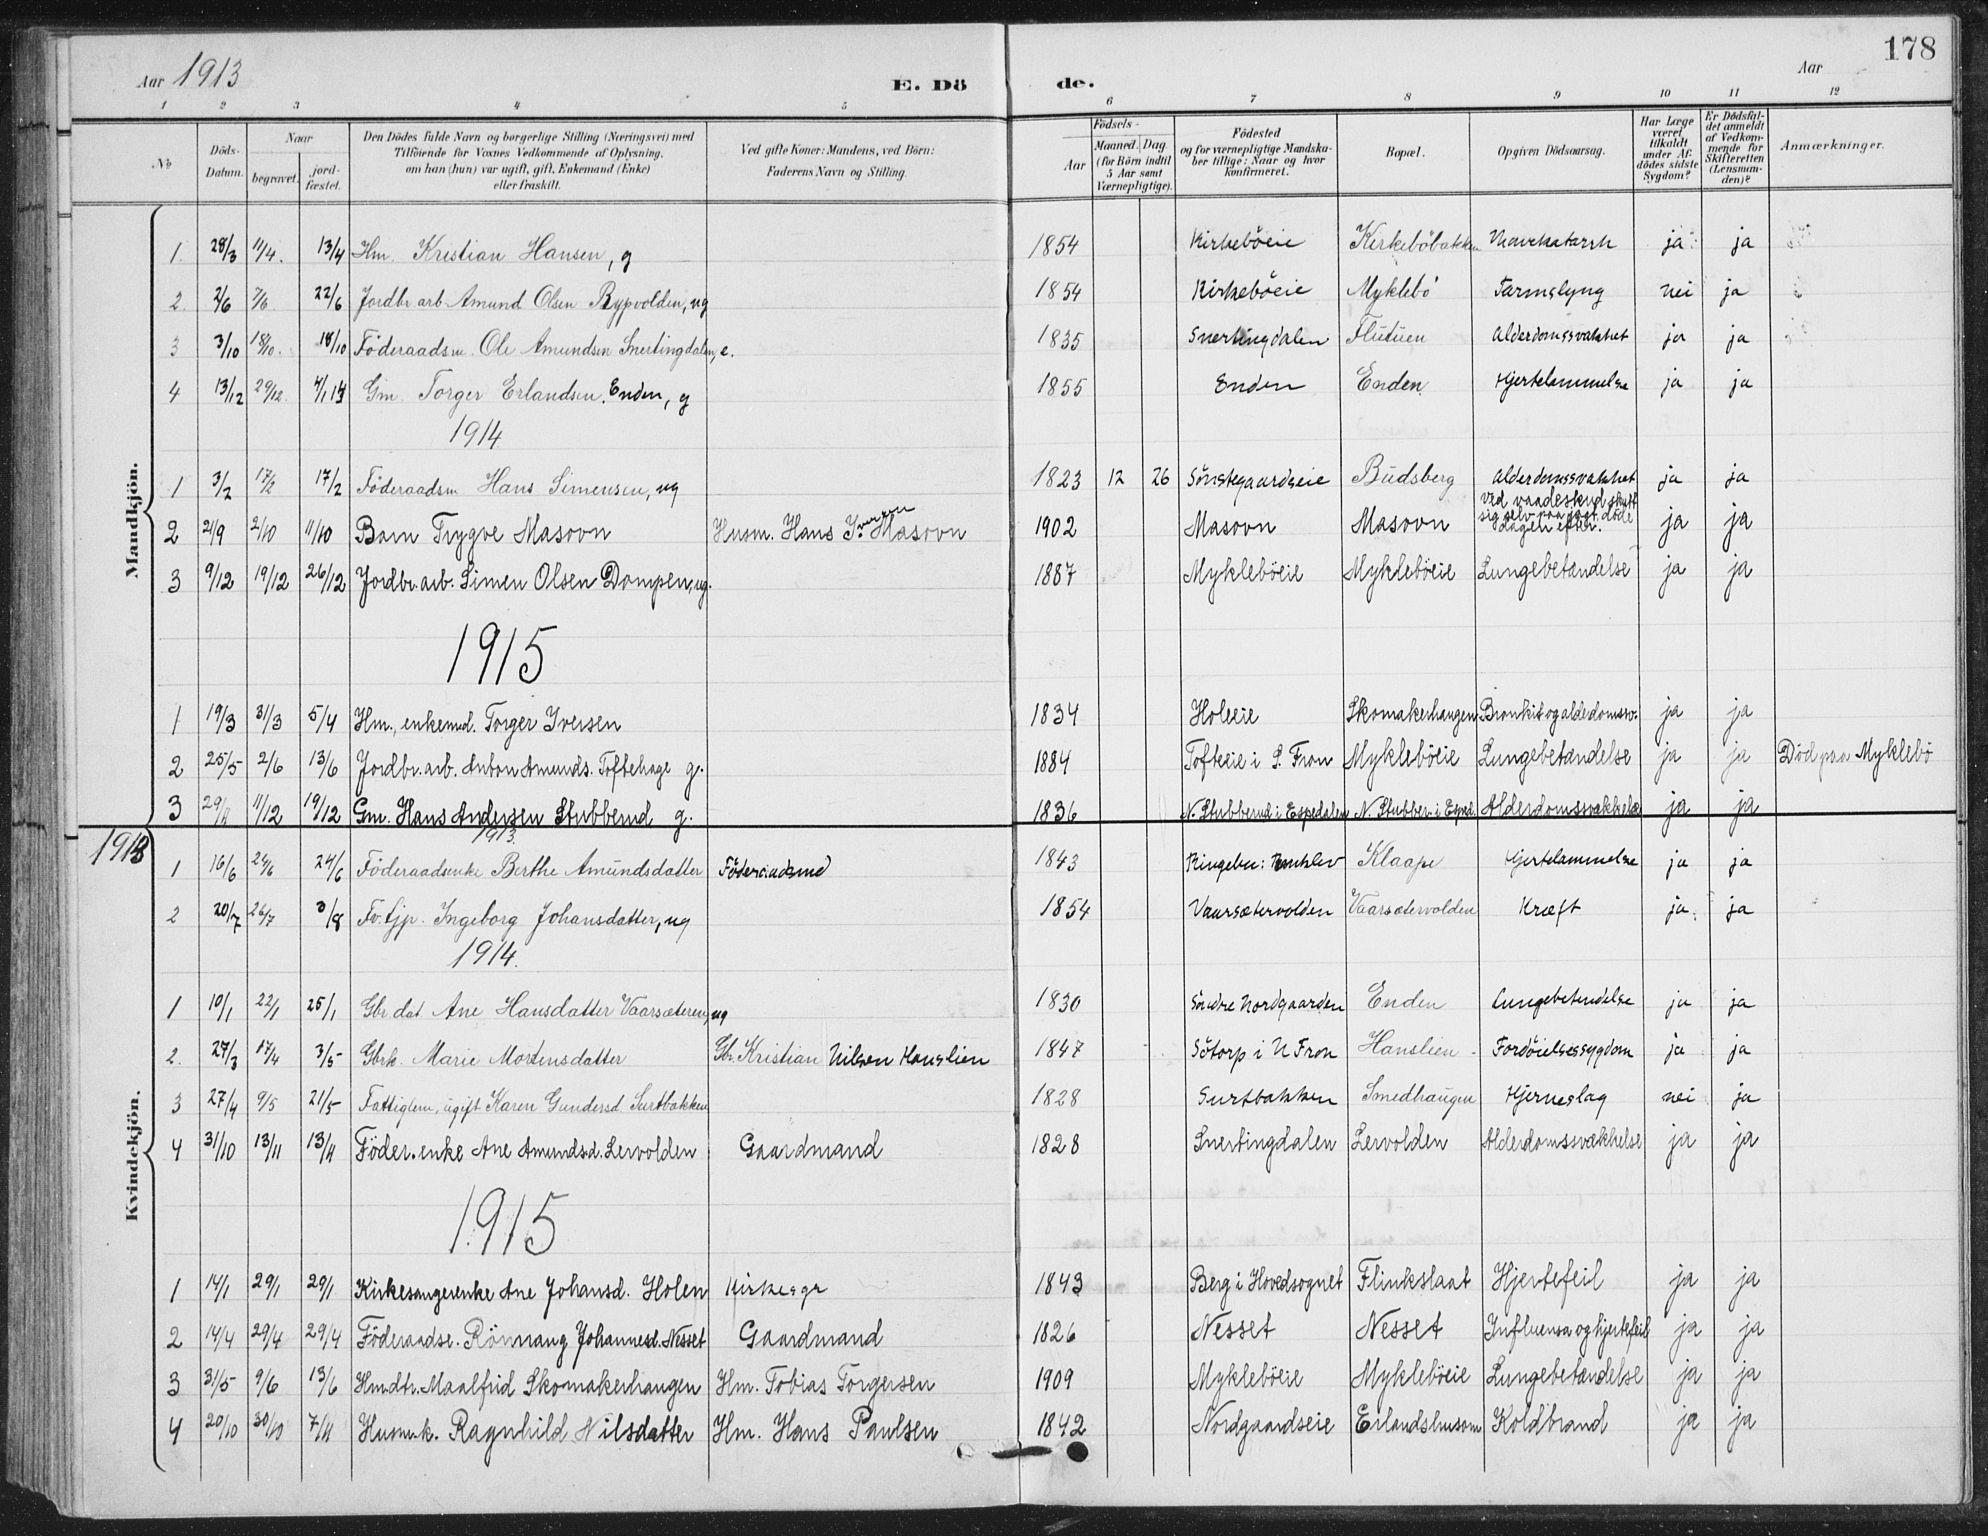 SAH, Vestre Gausdal prestekontor, Klokkerbok nr. 4, 1898-1939, s. 178